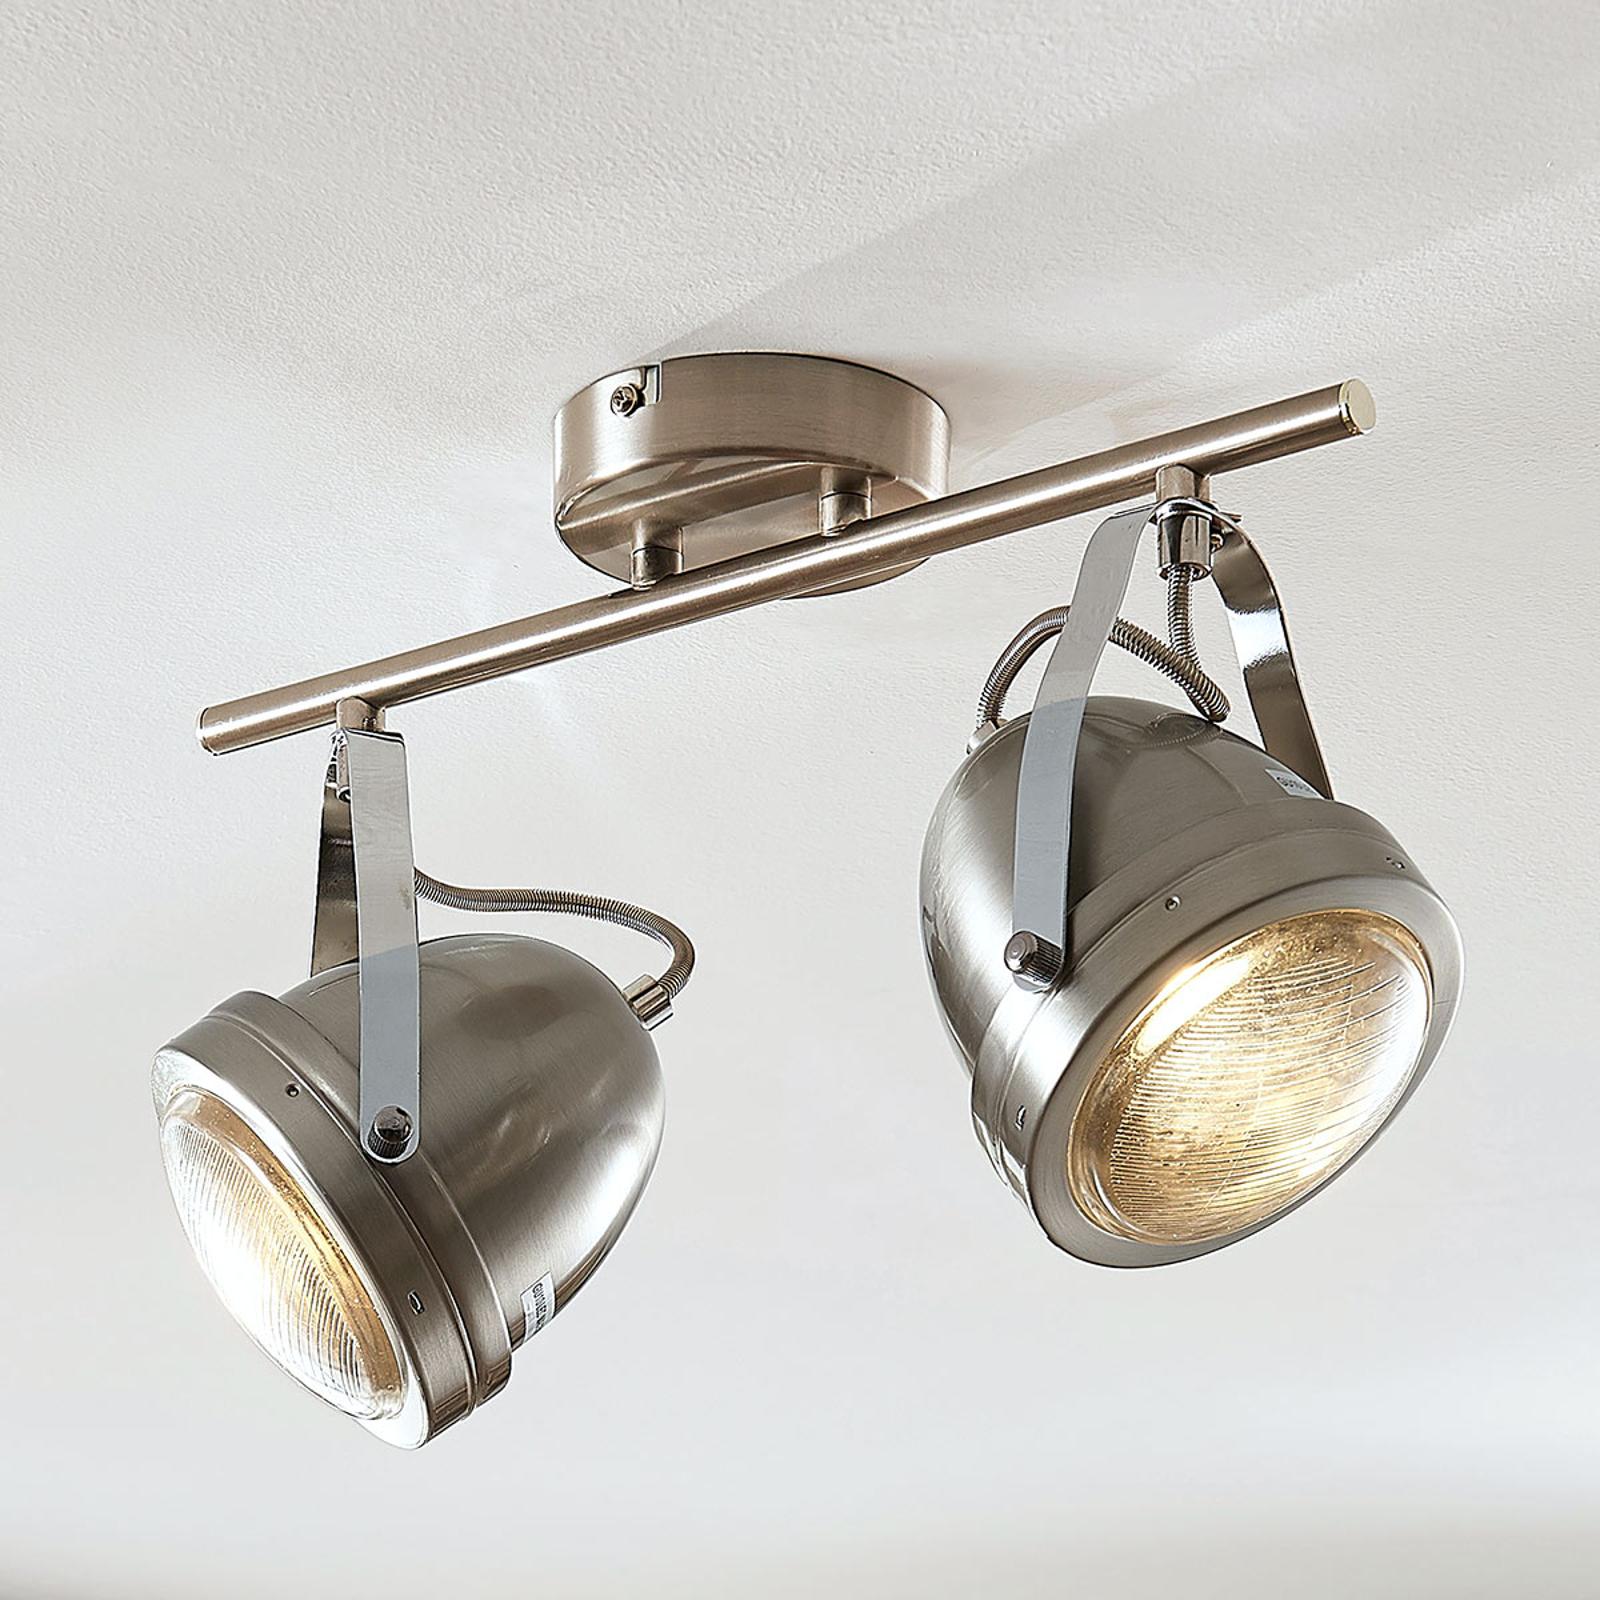 Spot pour plafond Zoja, à 2 lampes